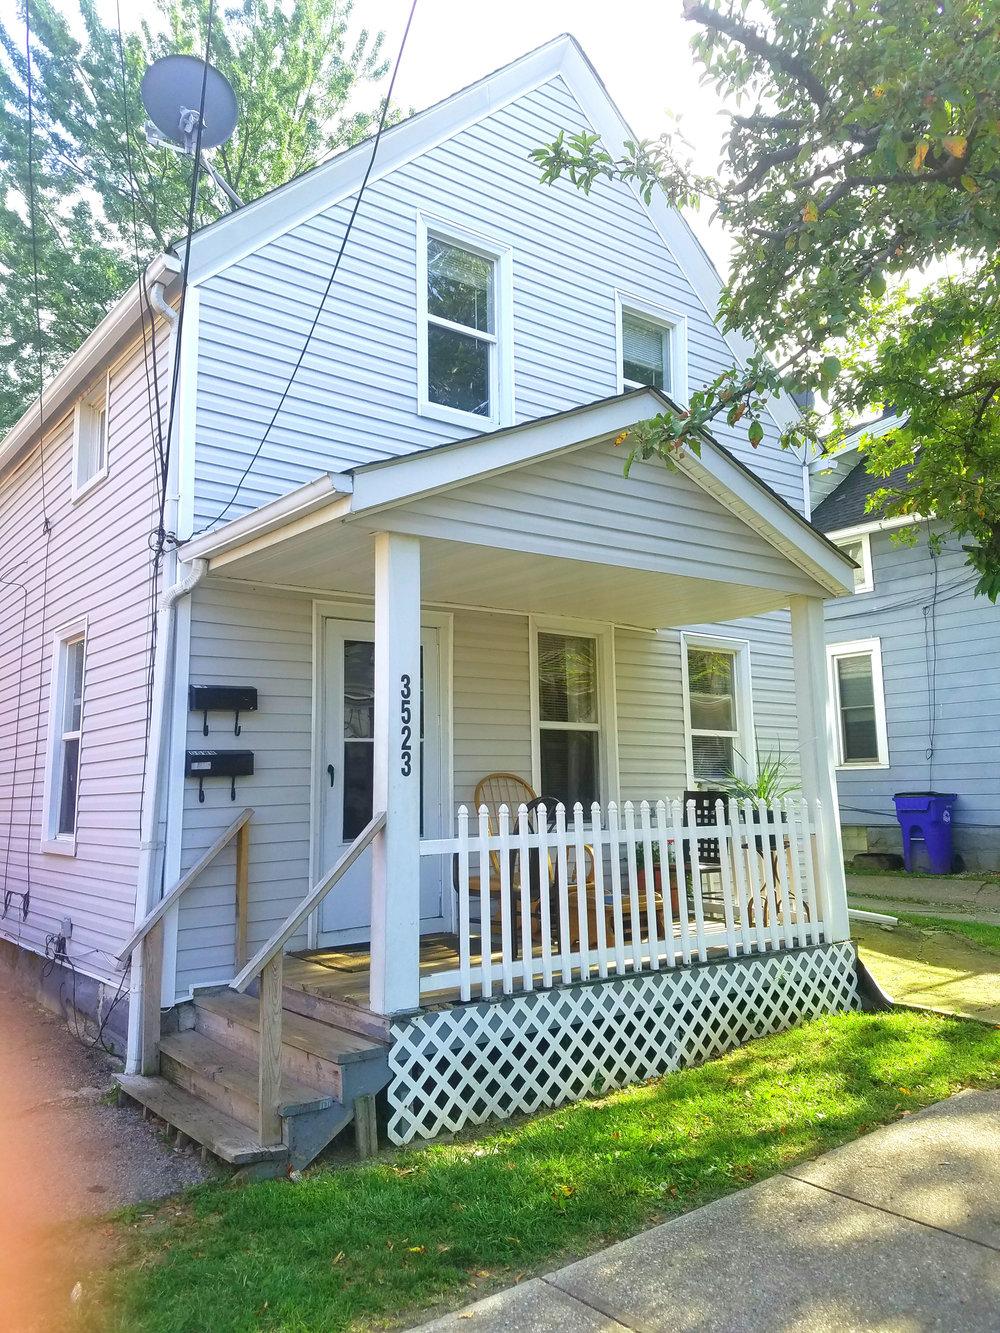 3523 Cecilia Ave., Cleveland | 2 bed 2 bath | 1,330 Sq. Ft. | $25,000